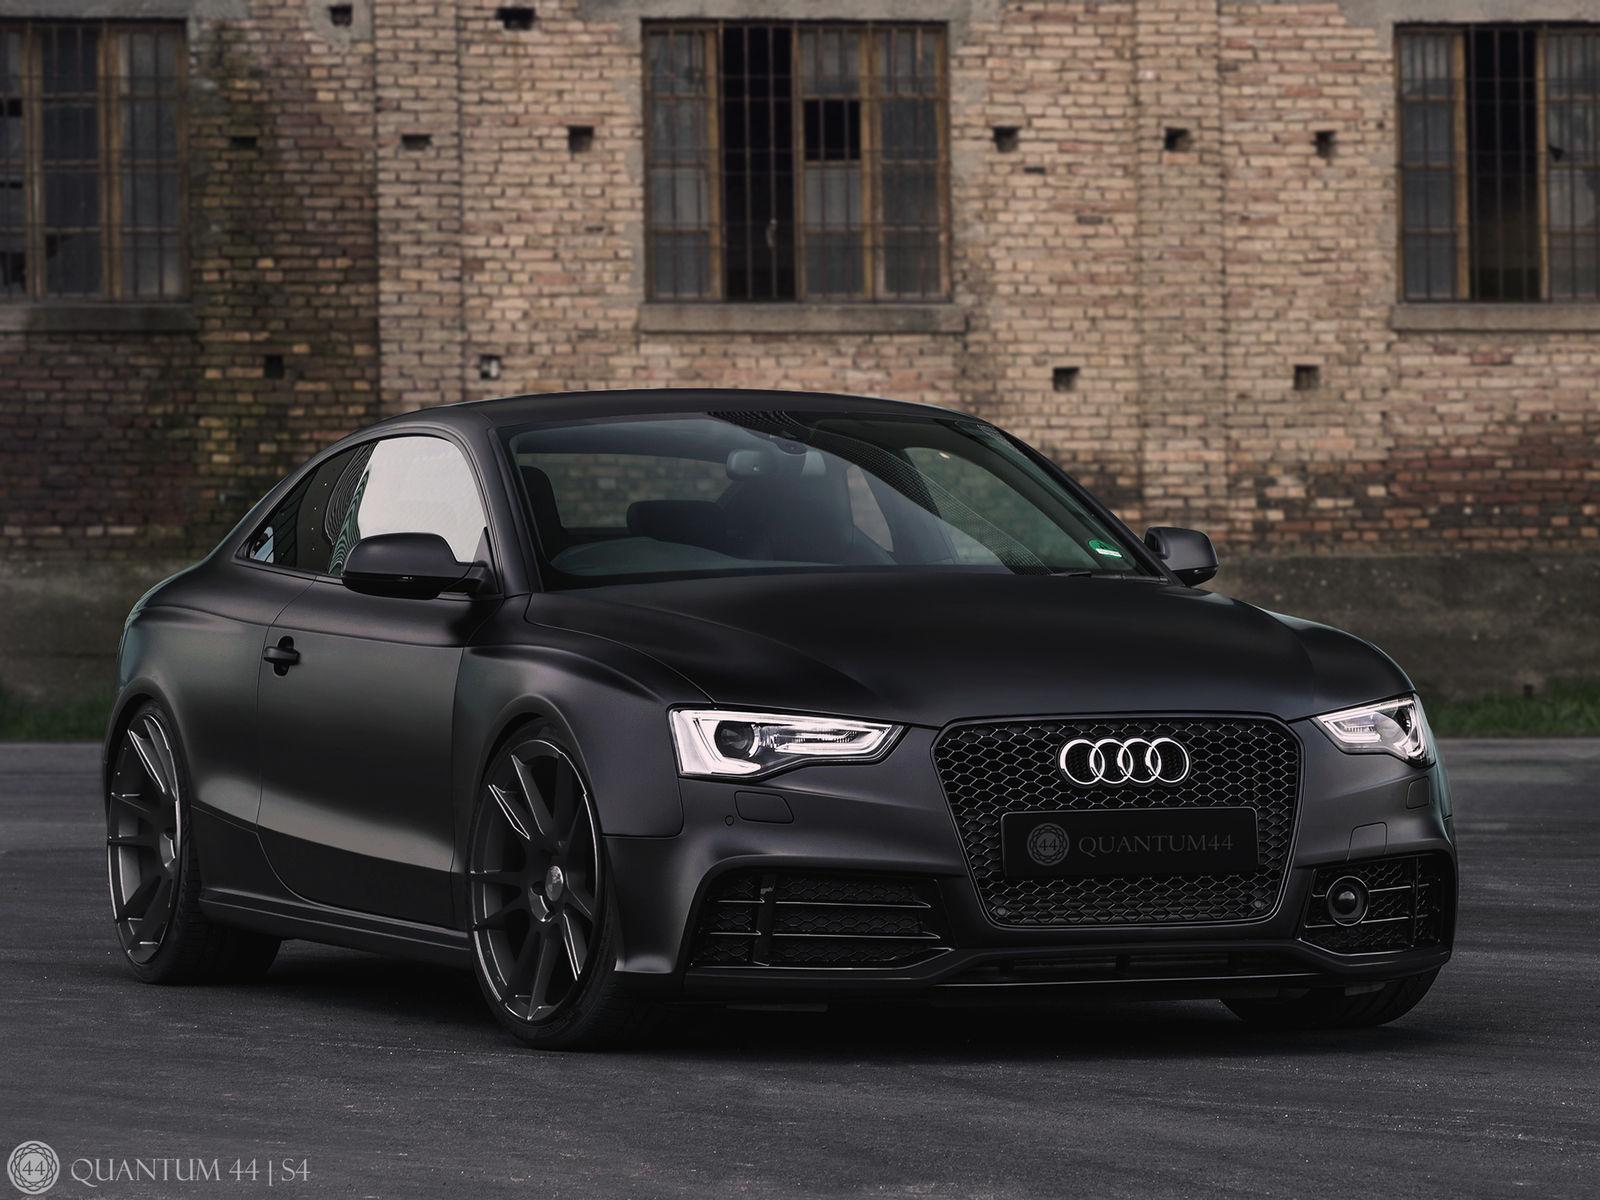 Audi RS 5 | Quantum44 S4 - Audi RS5